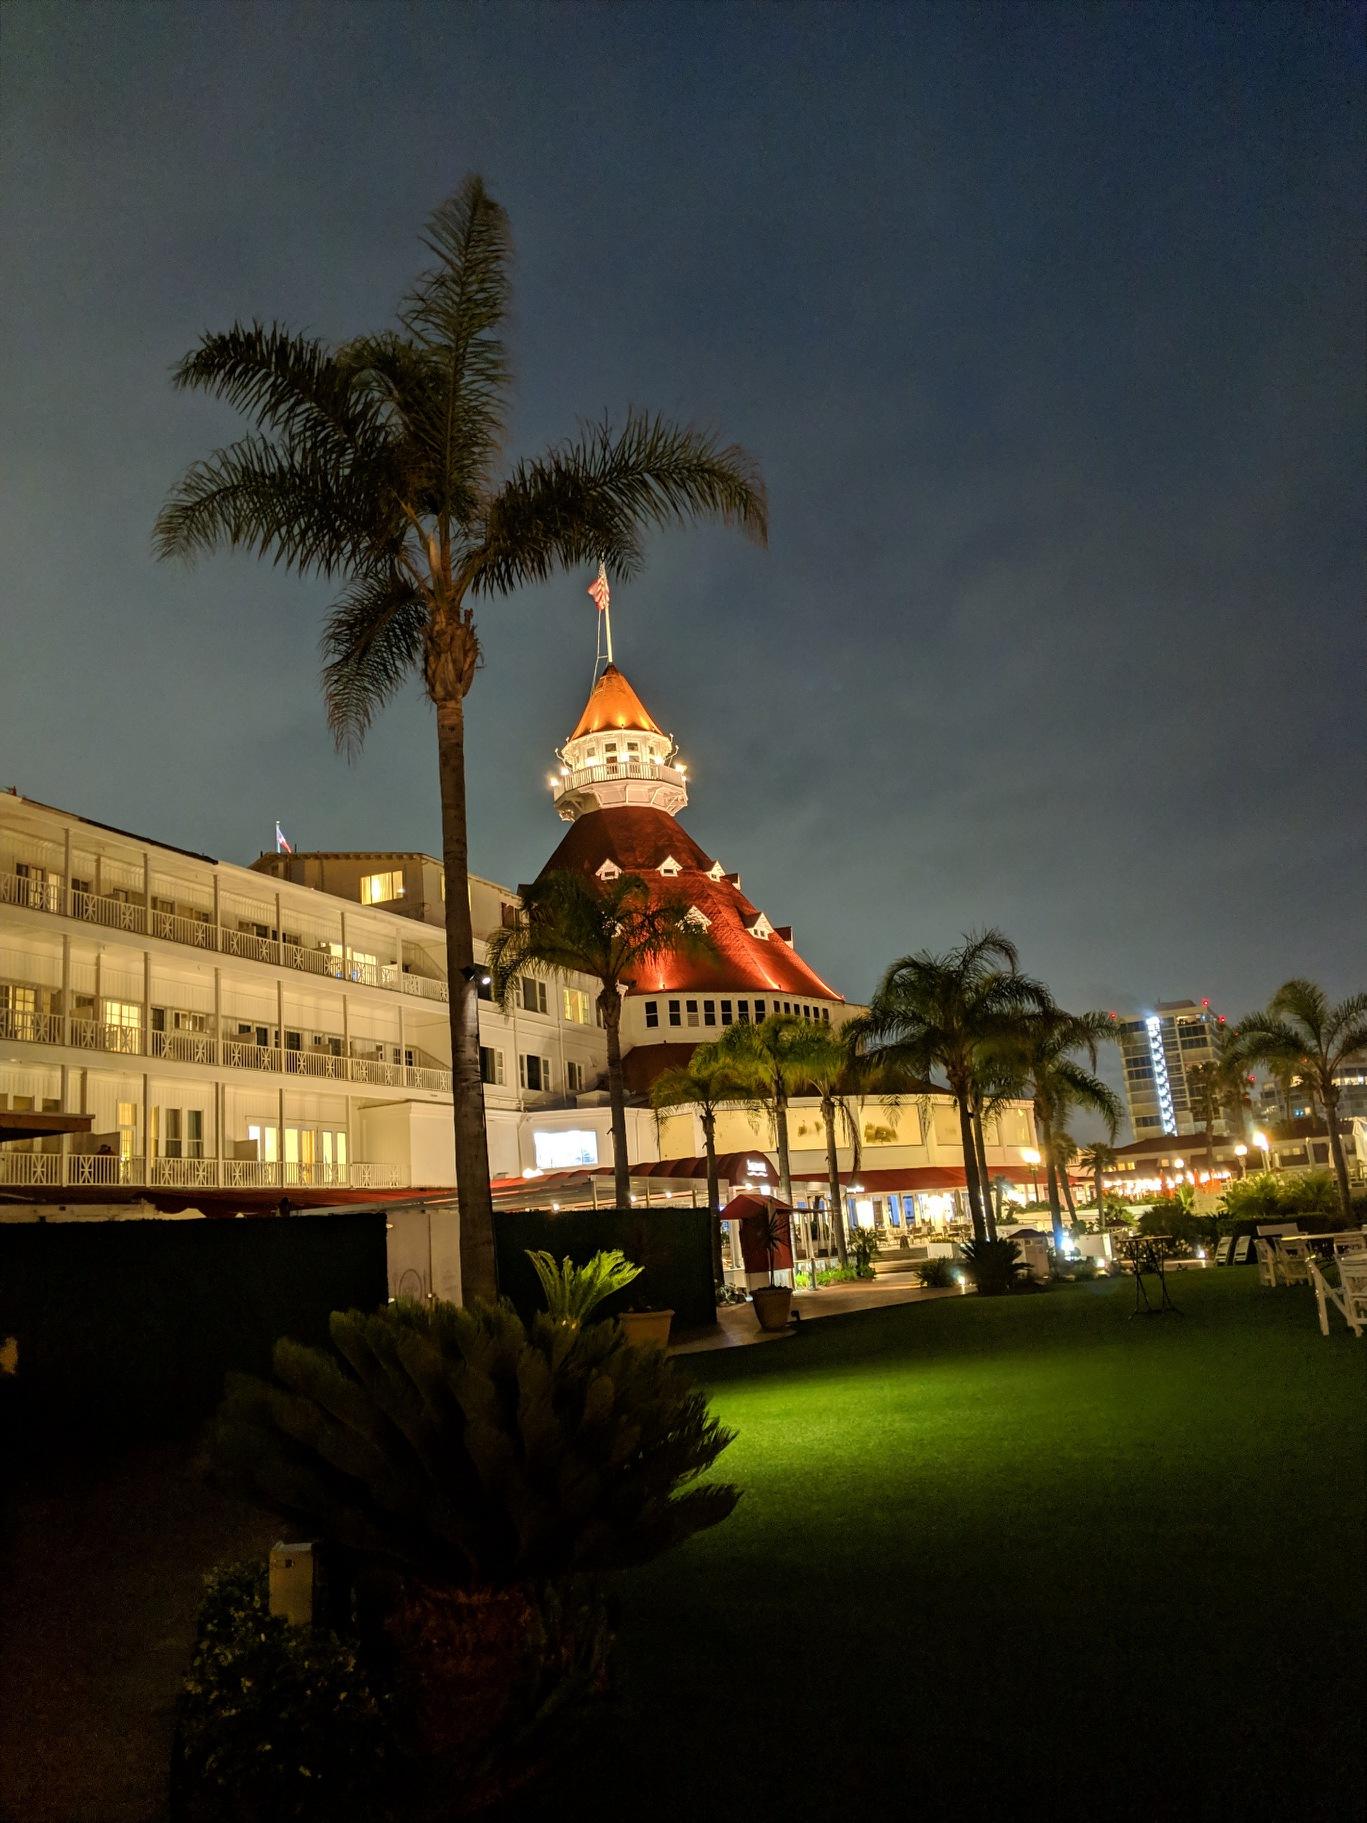 Coronado Island Hotels: Coronado Island, San Diego And La Jolla